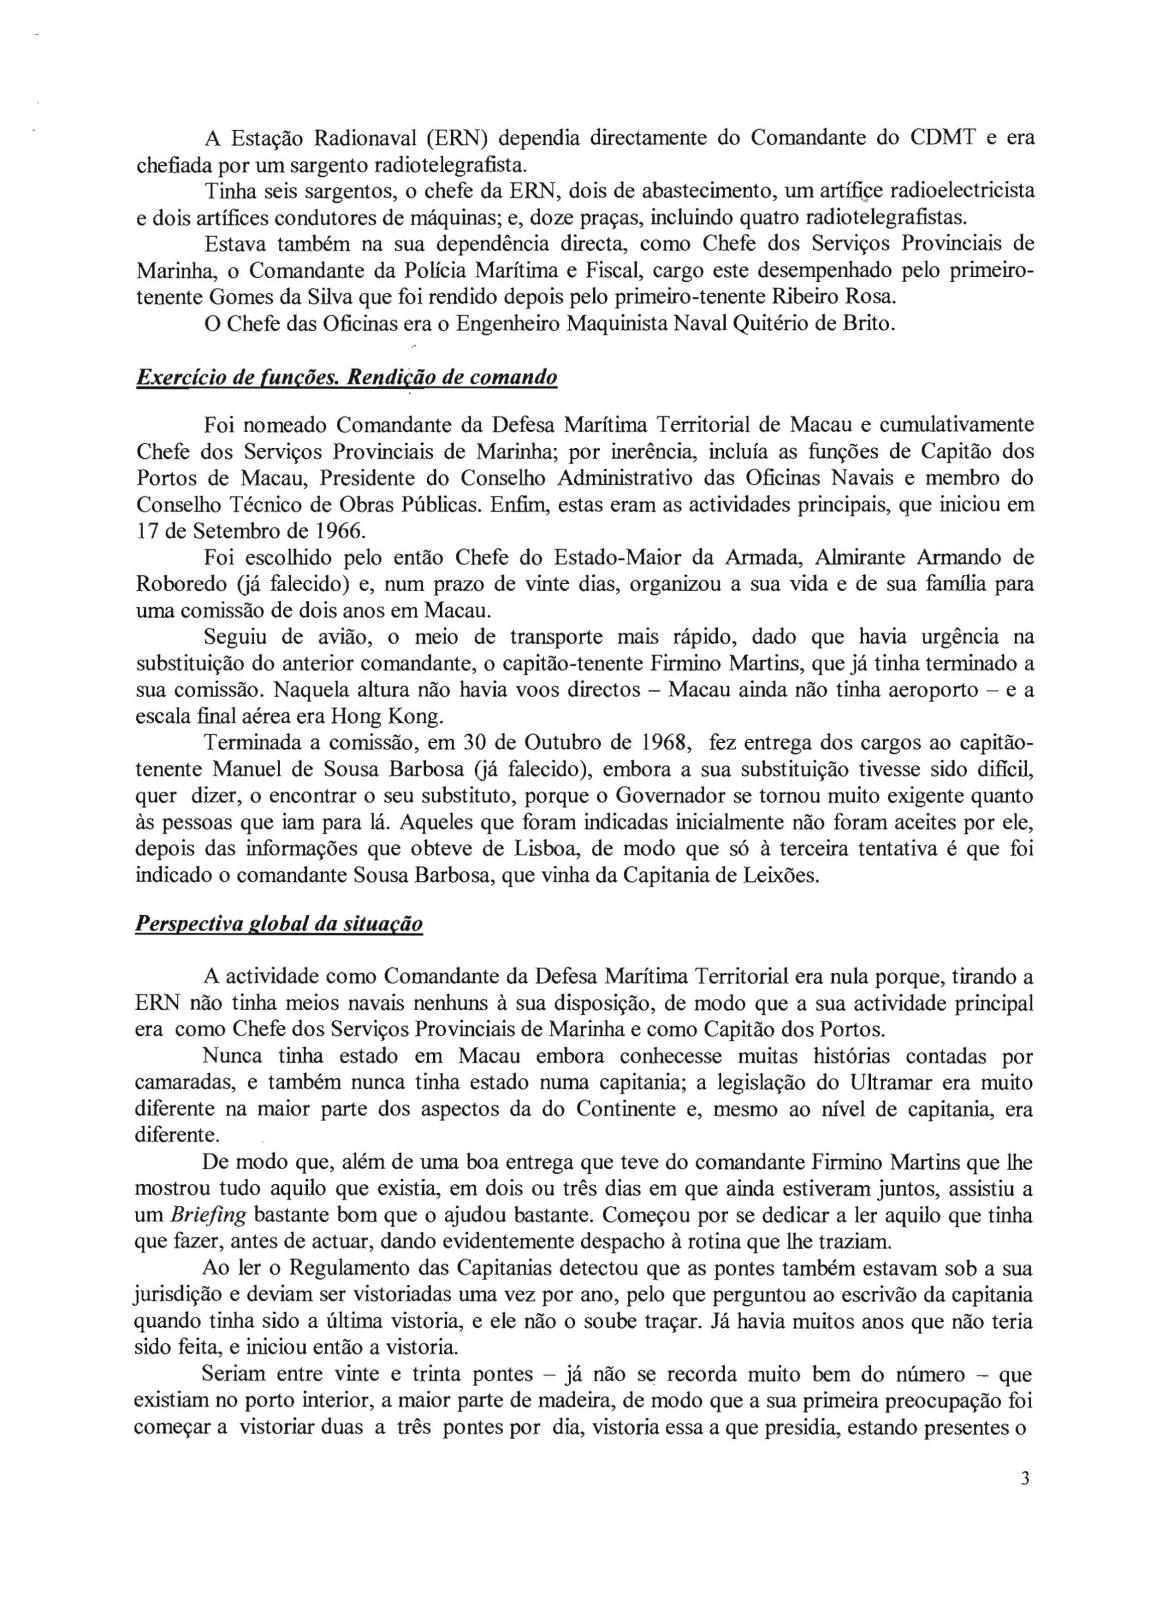 00468 01-03-28 Academia de Marinha-Entrevista do Alm Nunes da Silva pg 3 de 12